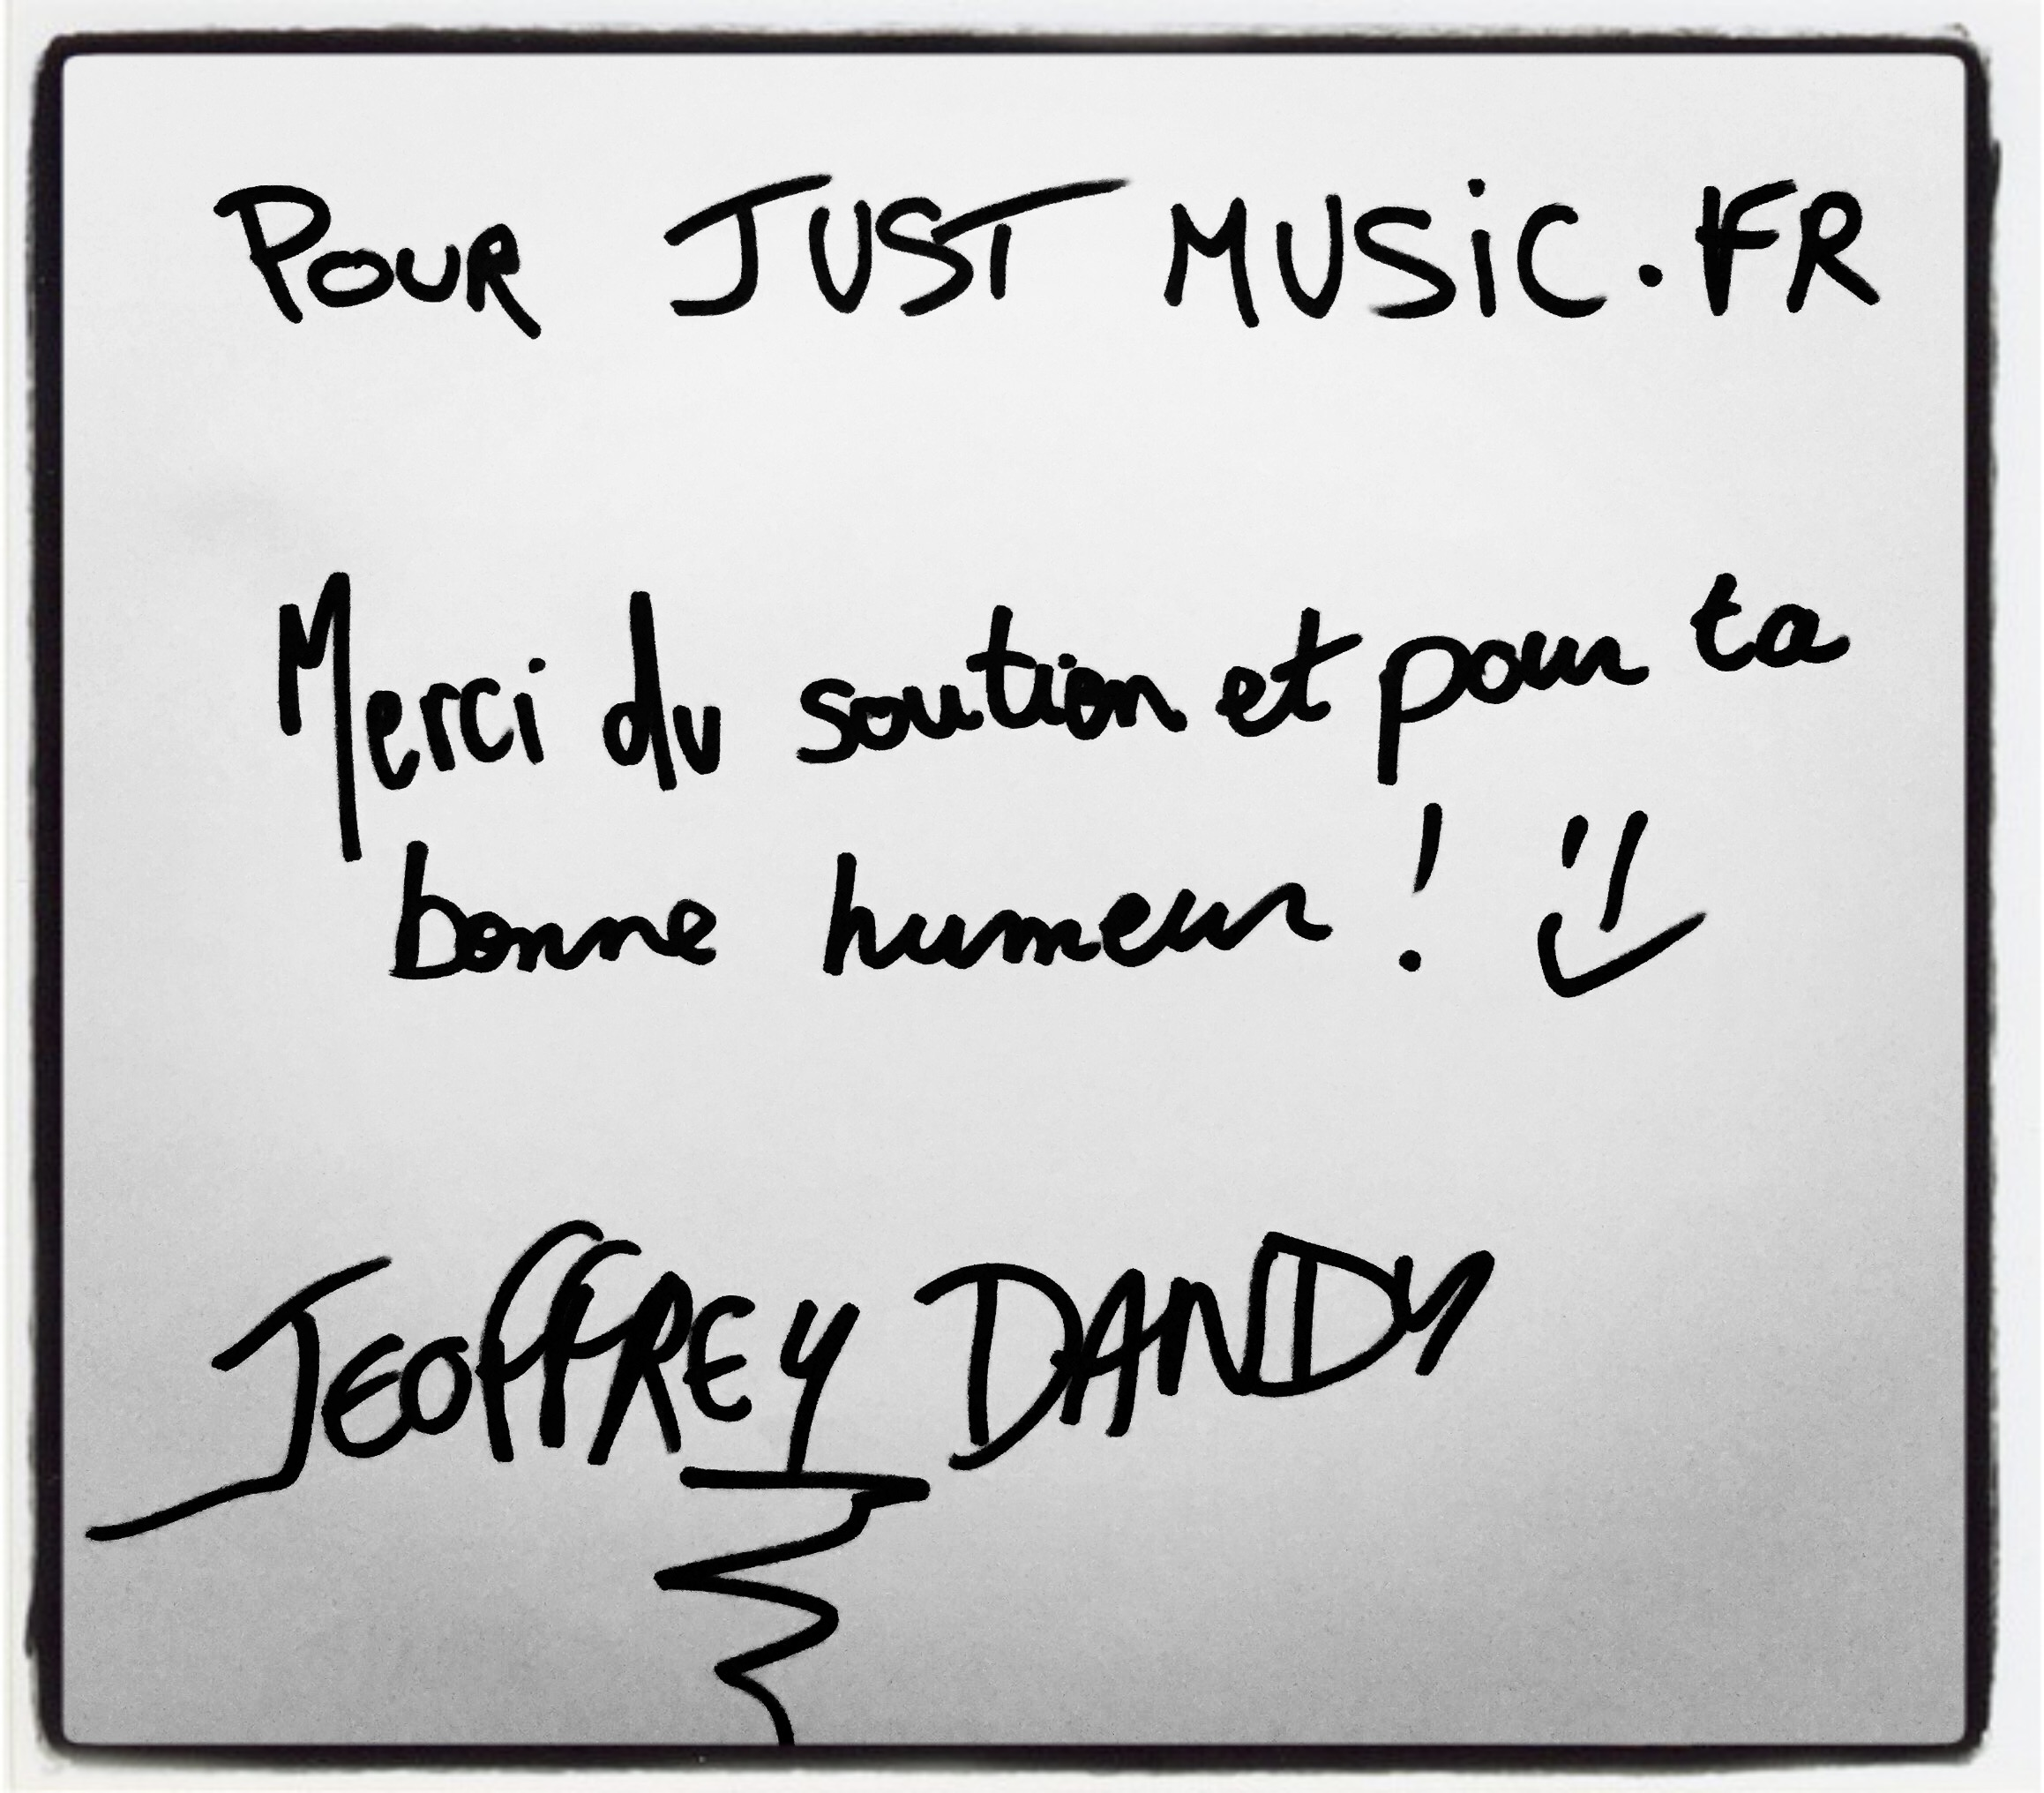 jeoffrey-dandy-justmusic-fr-dedicace